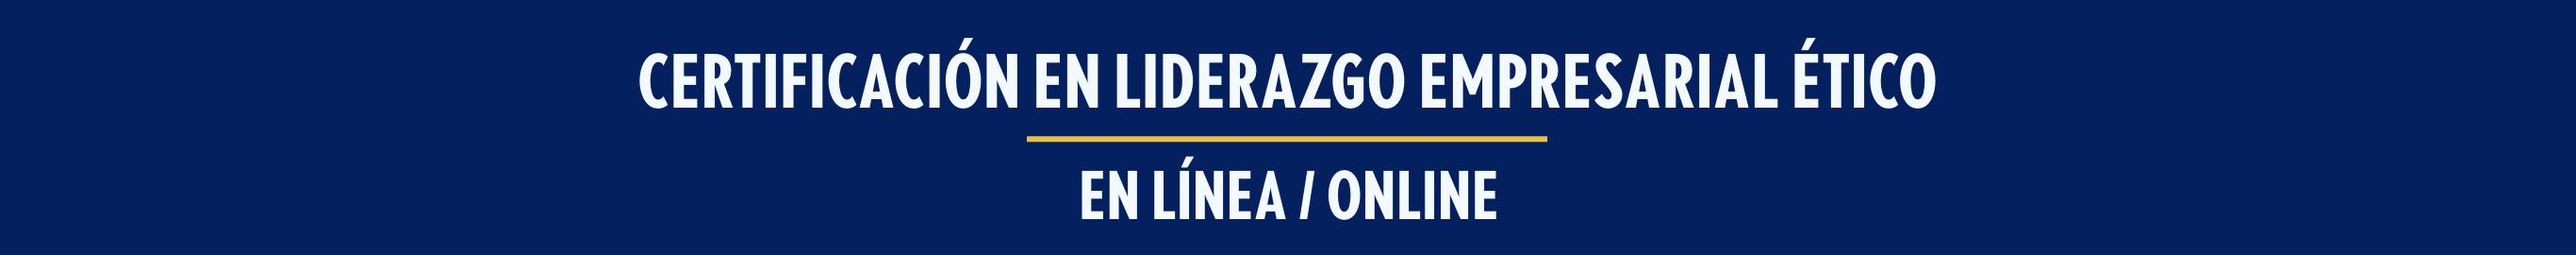 Hero - Certificacion en Liderazgo...@2x